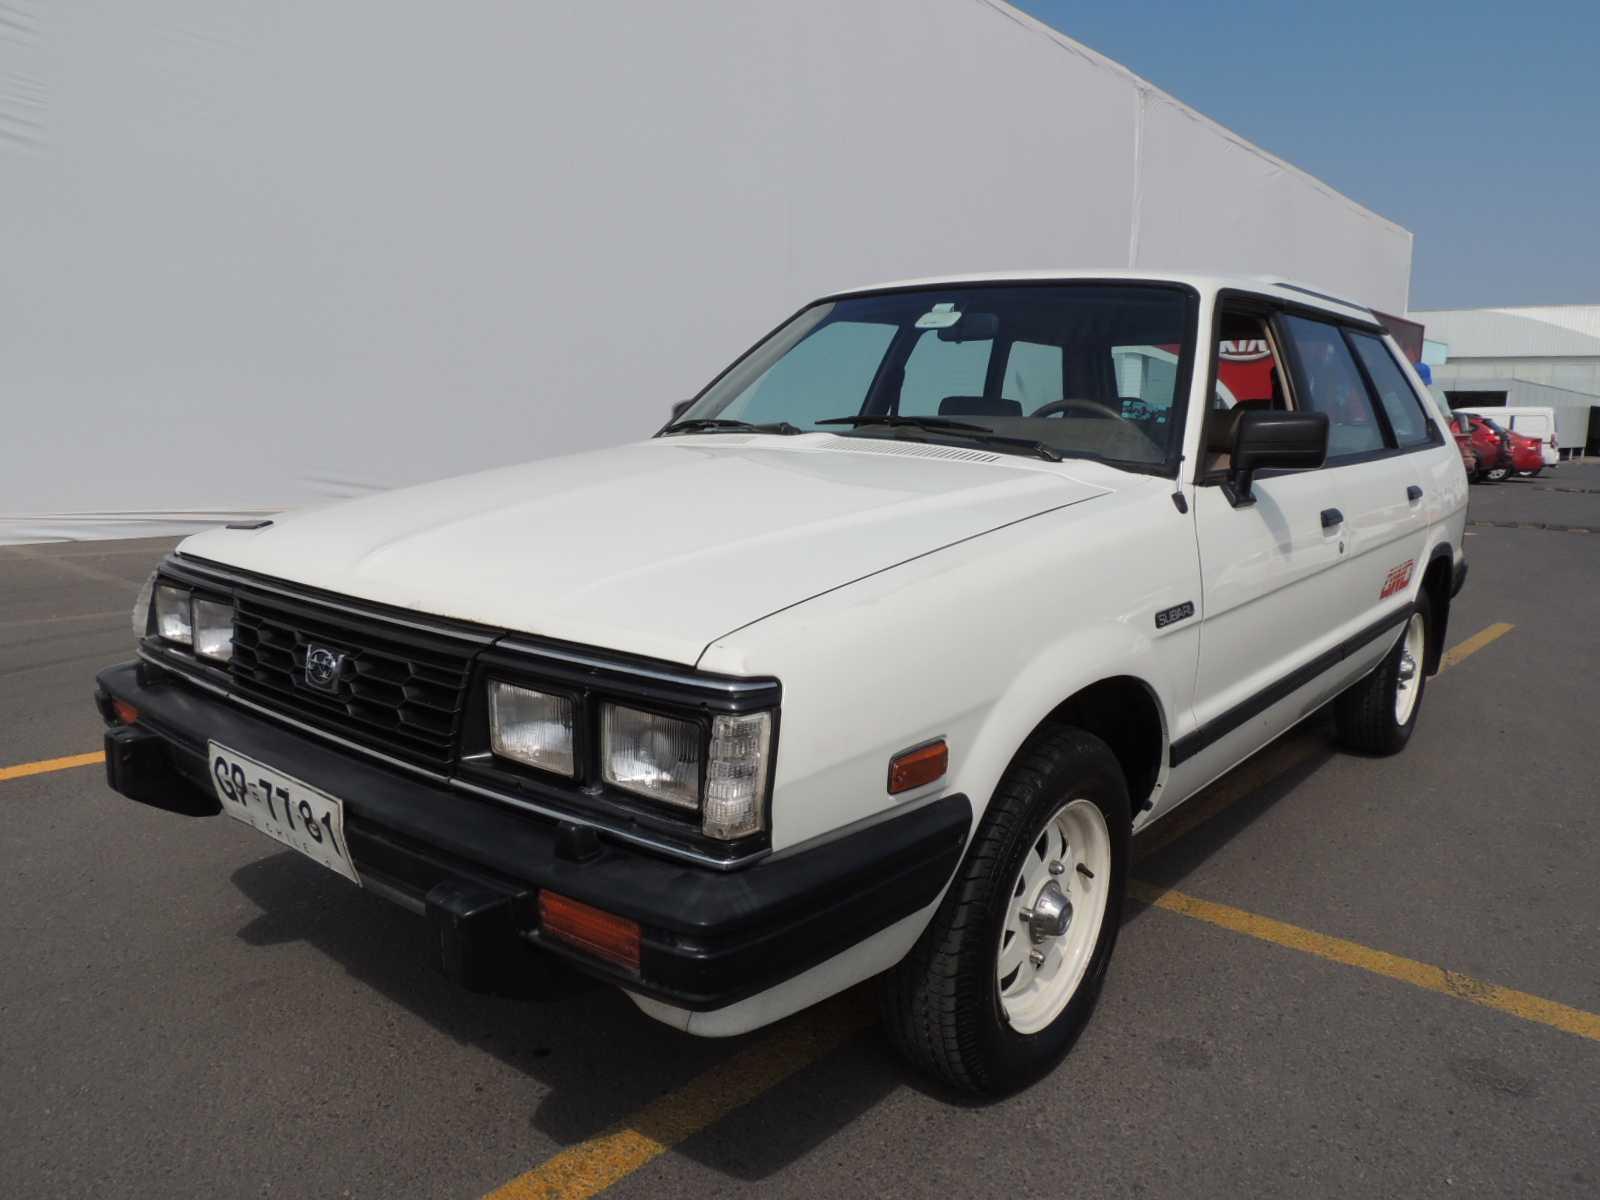 Subaru 1800 GLF 4WD 1983 (23)